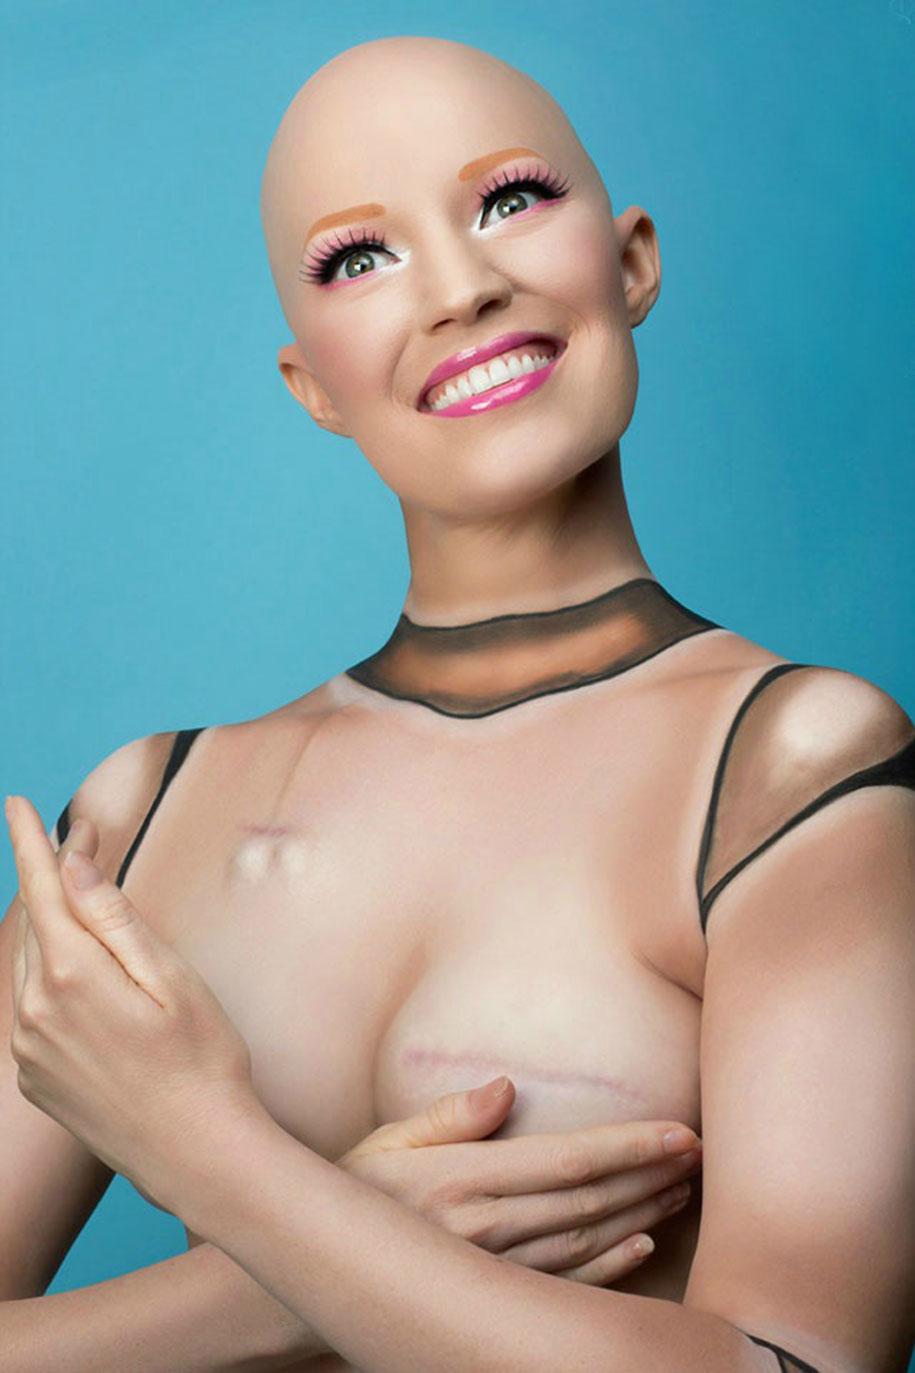 cancer-mastectomy-photo-series-my-breast-choice-aniela-mcguinness-4